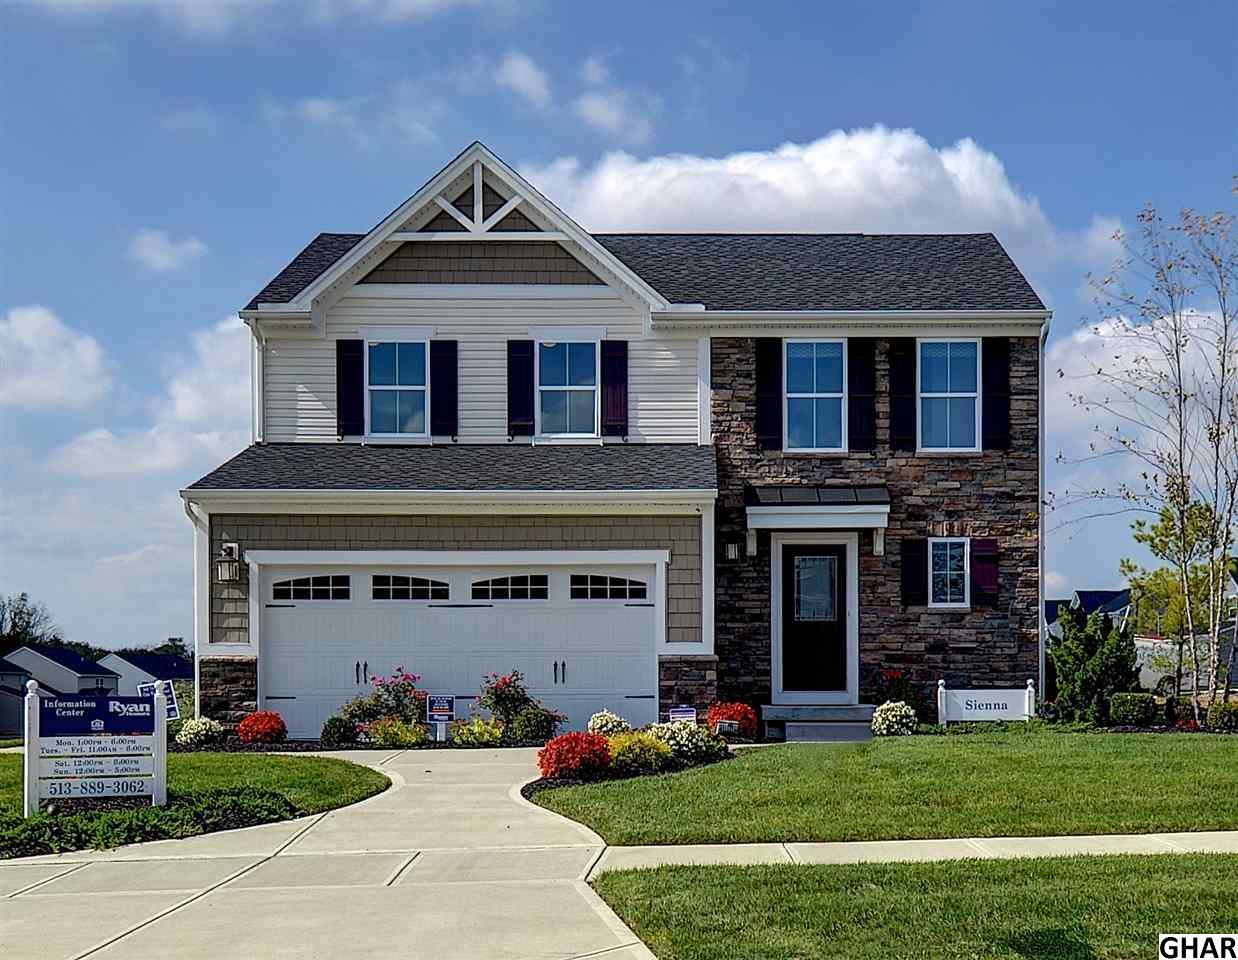 4385 Grandview Rd, Hanover, PA 17331